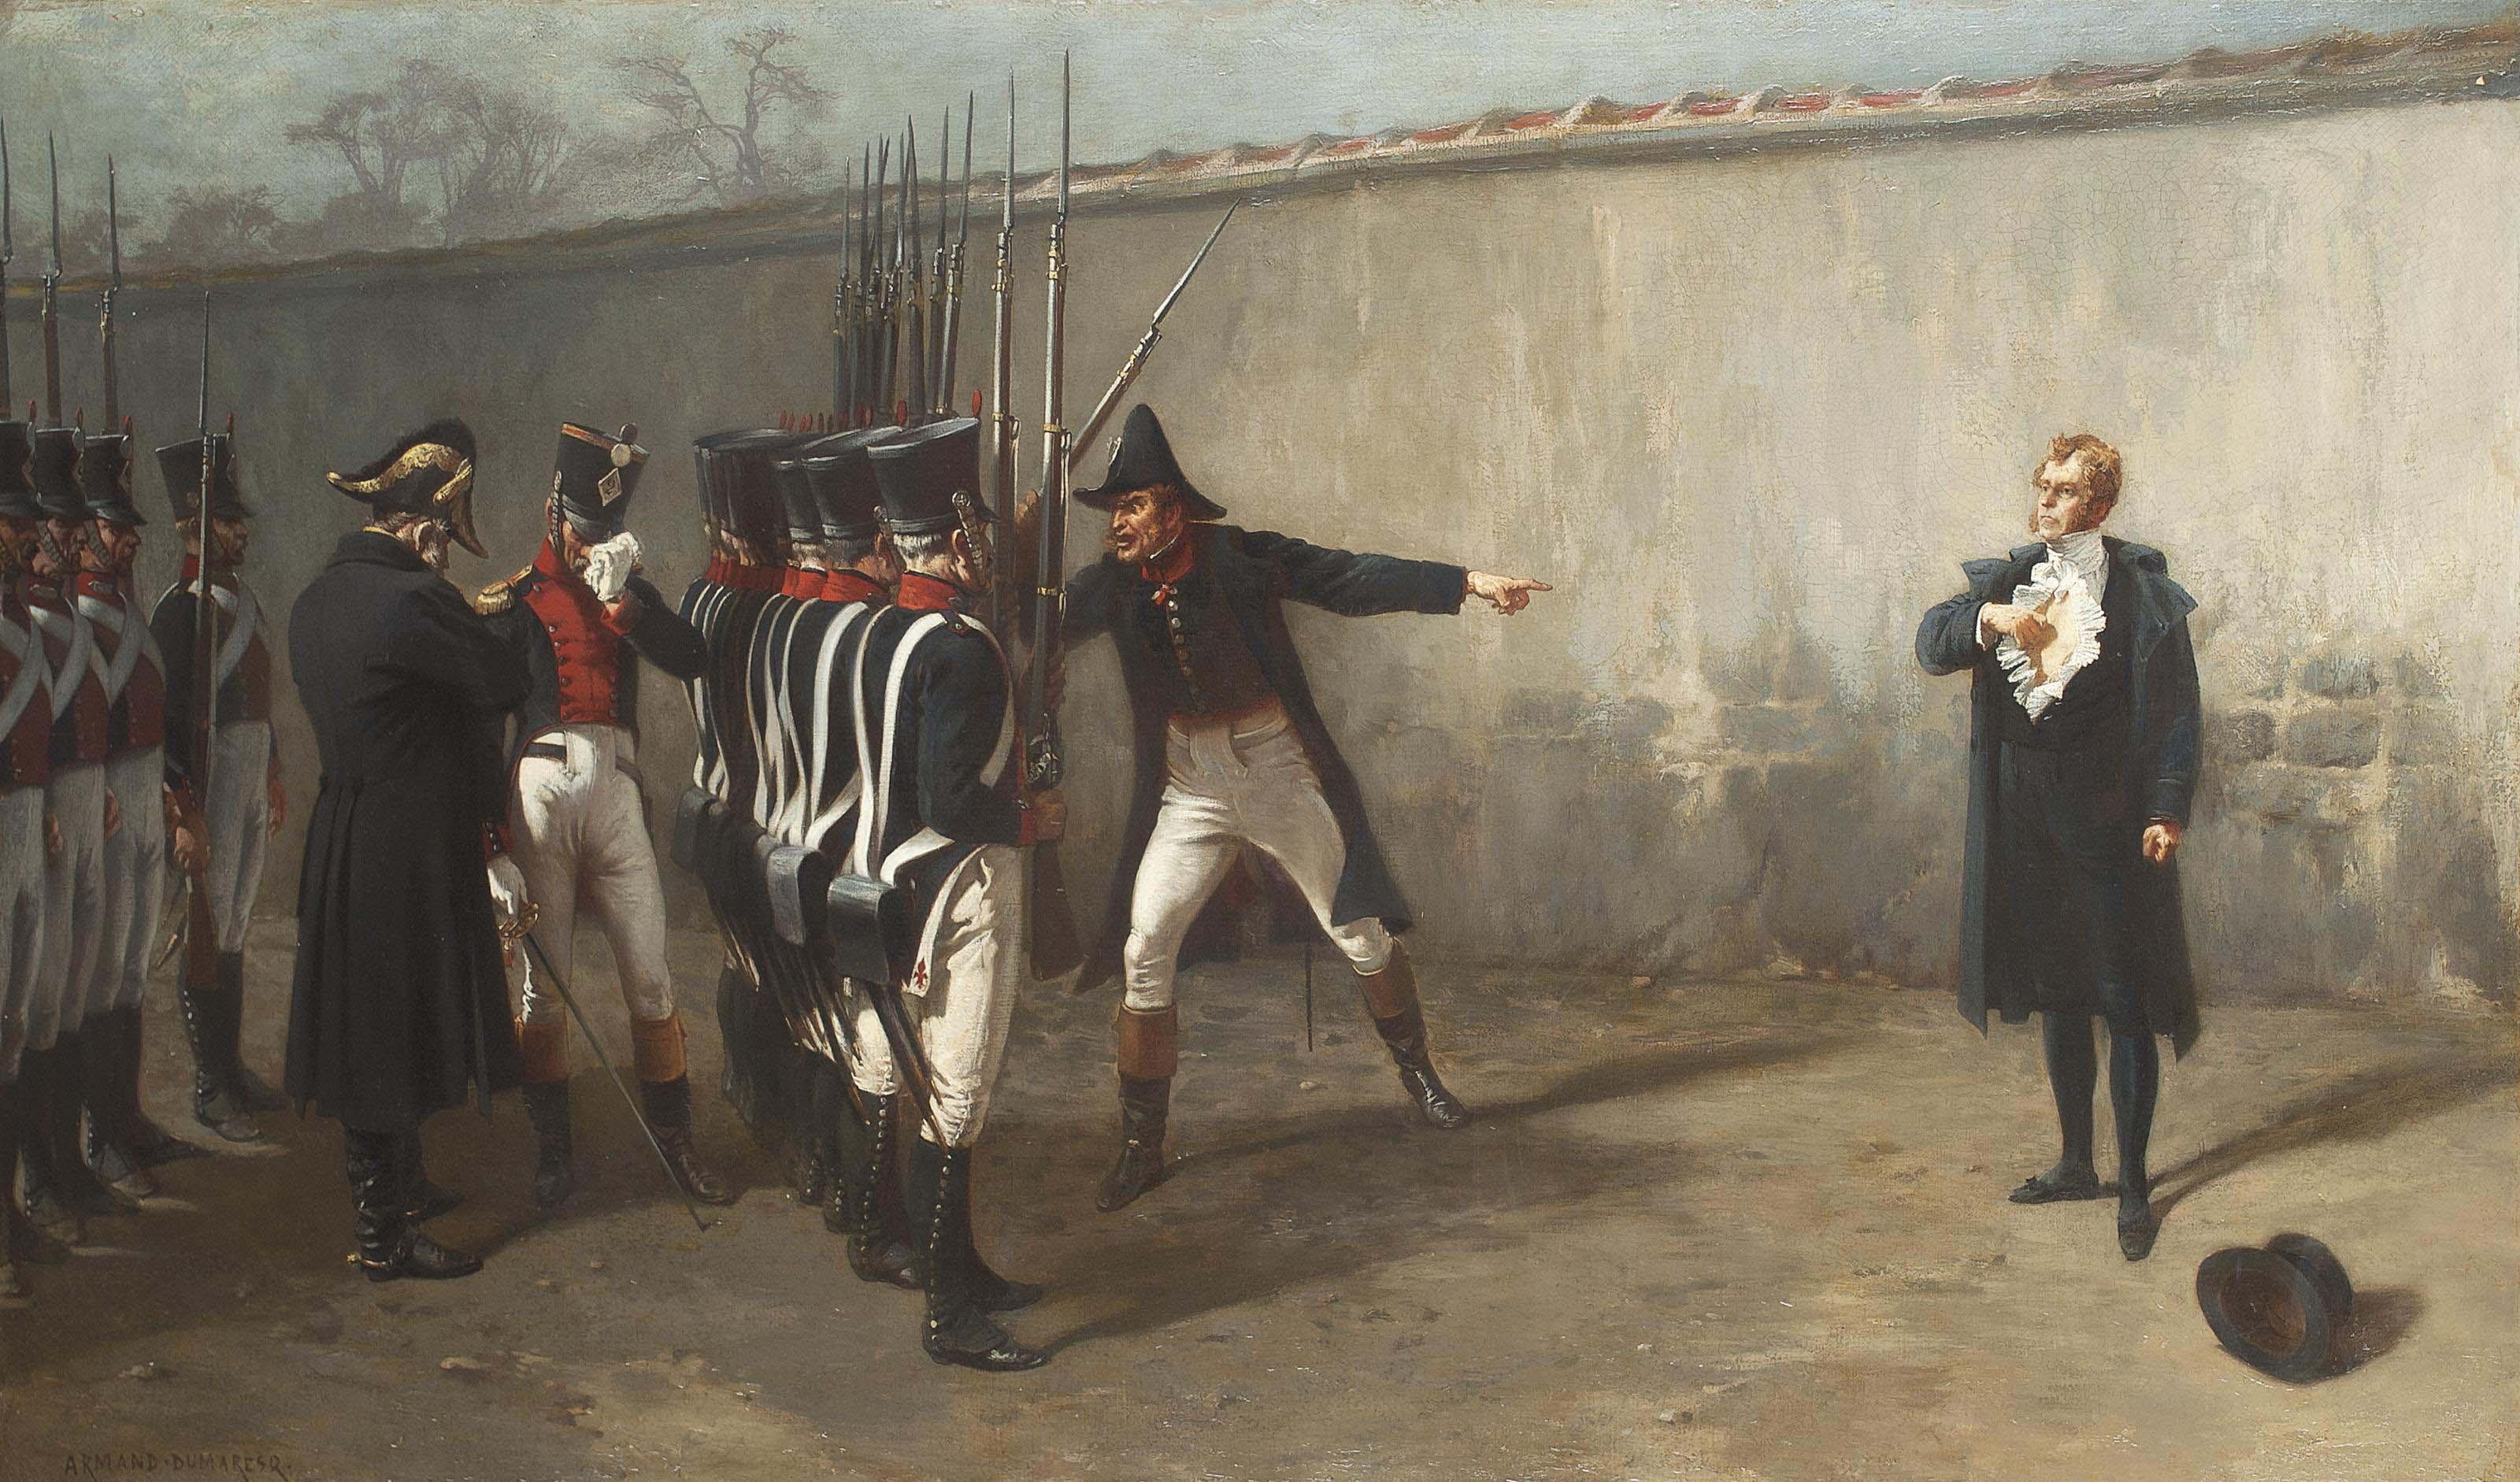 The execution of Mariéchal Ney